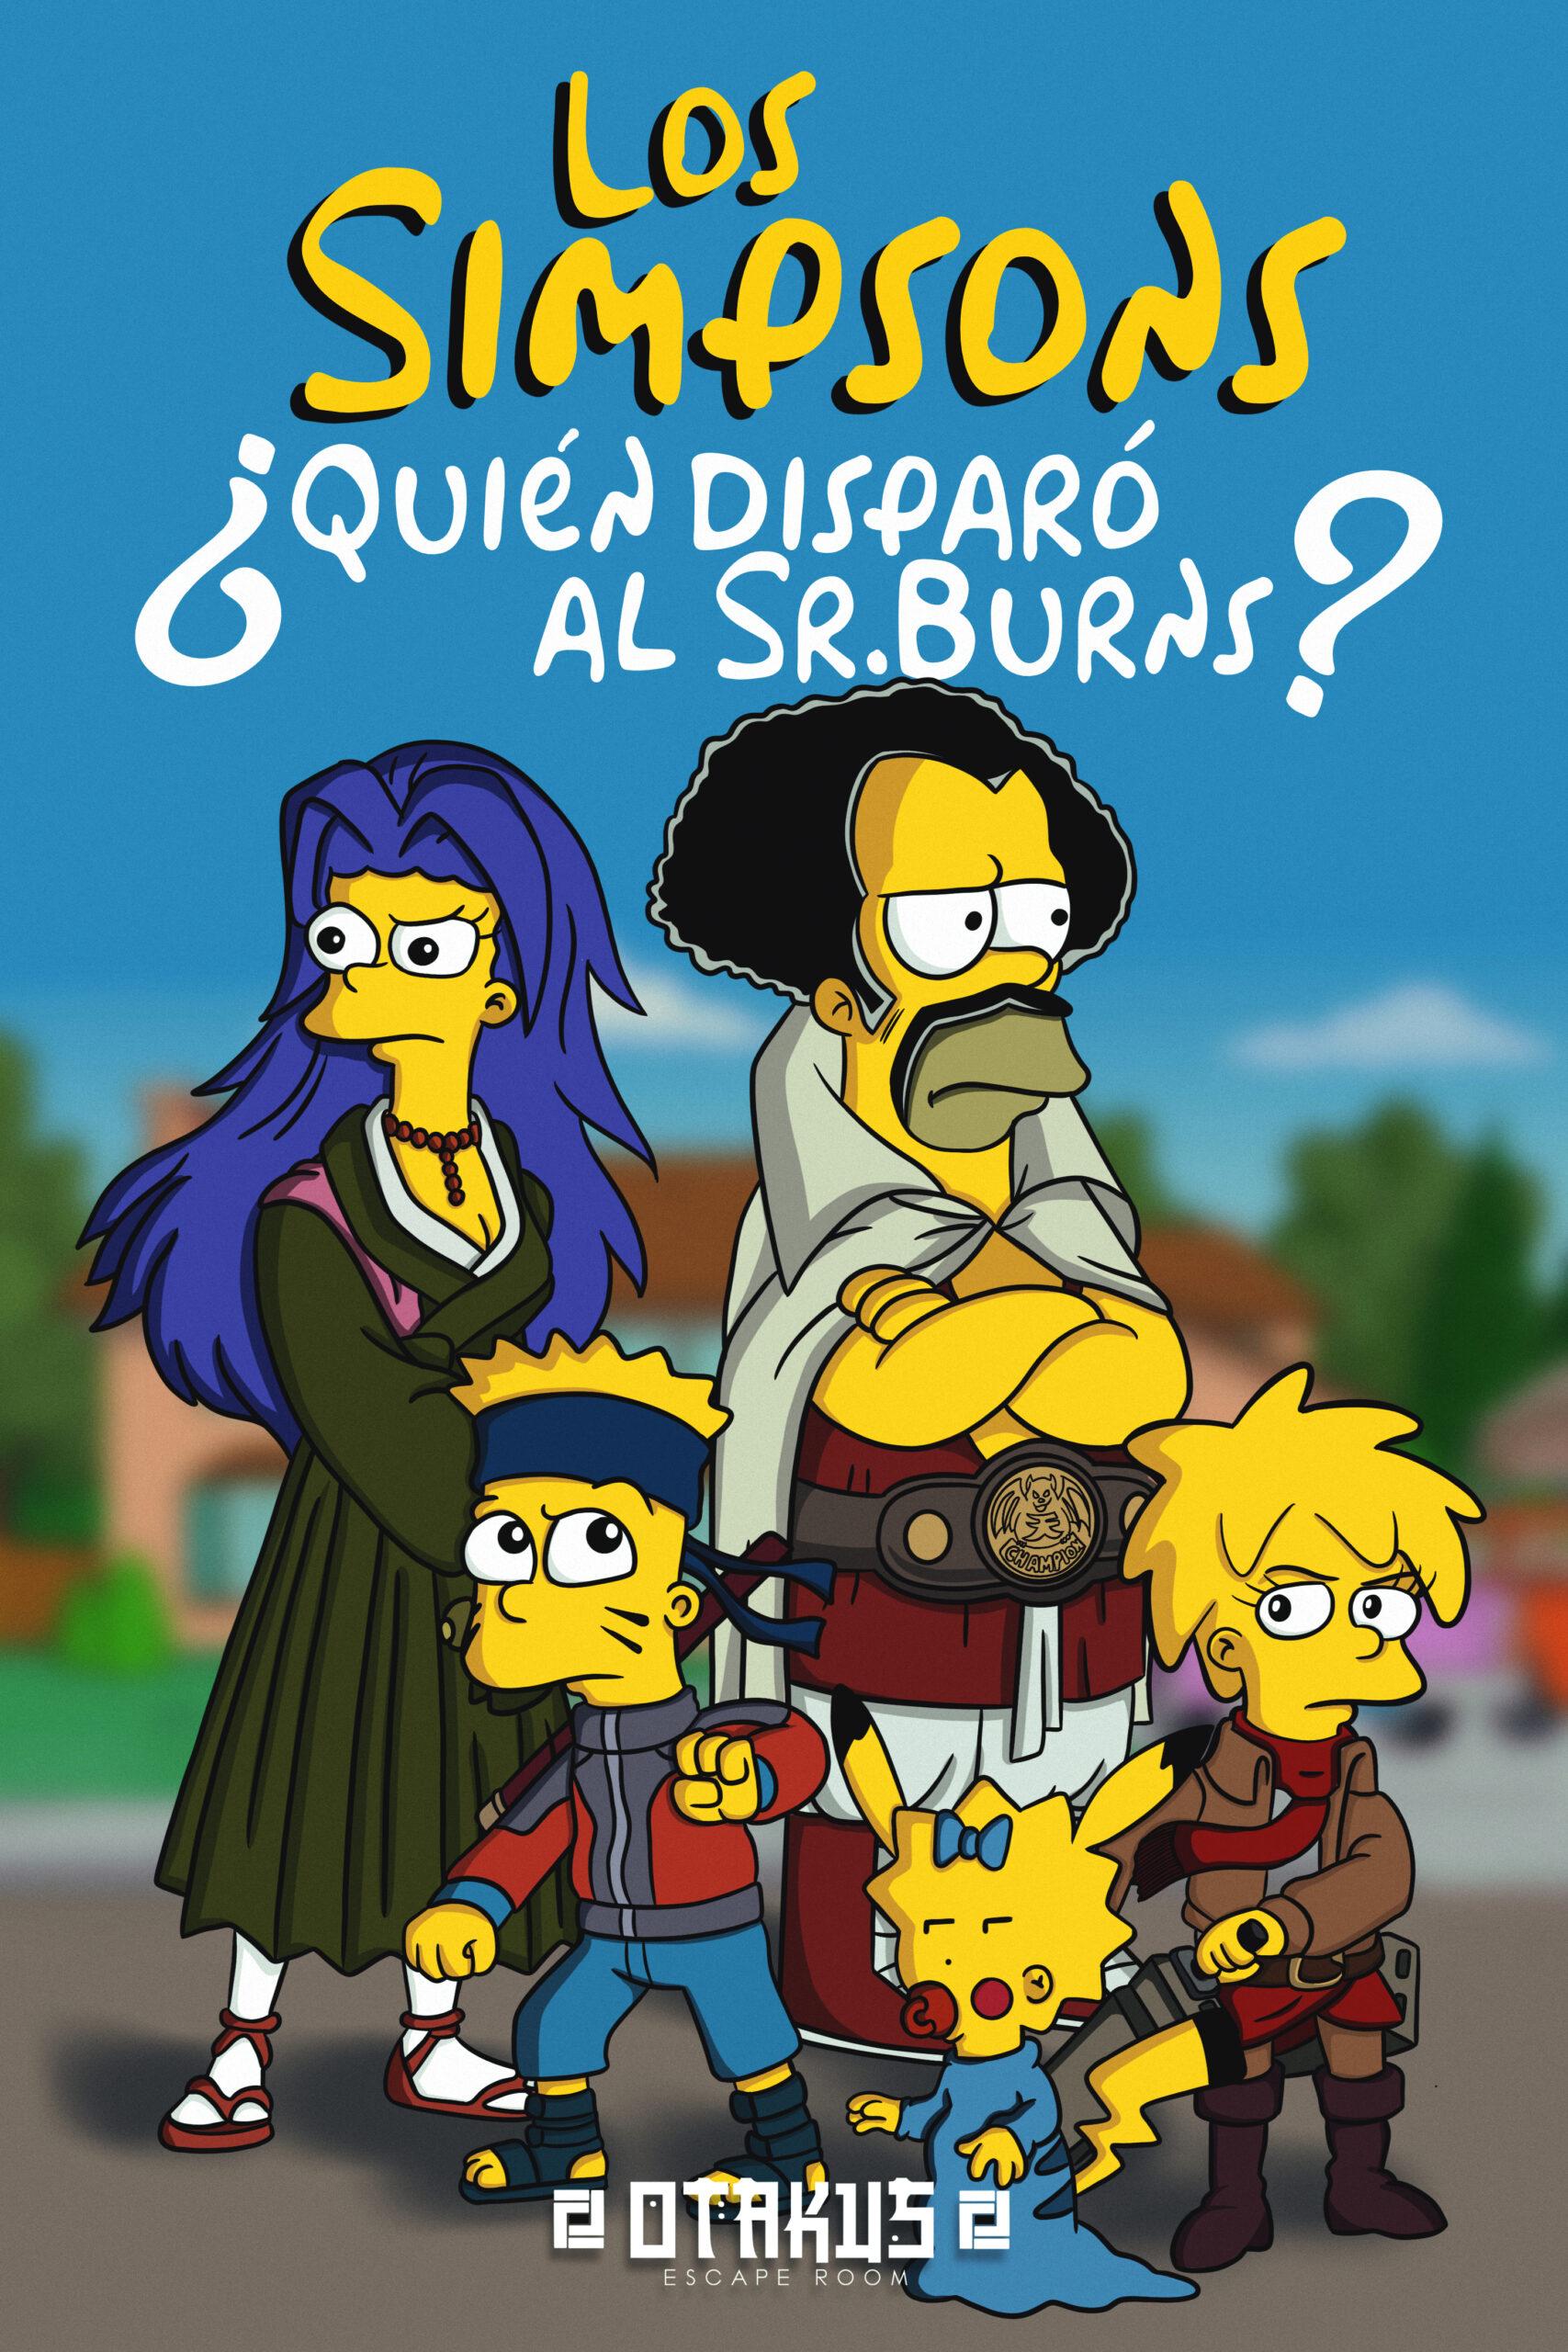 escape room Los Simpsons ¿Quién disparó al Sr. Burns?